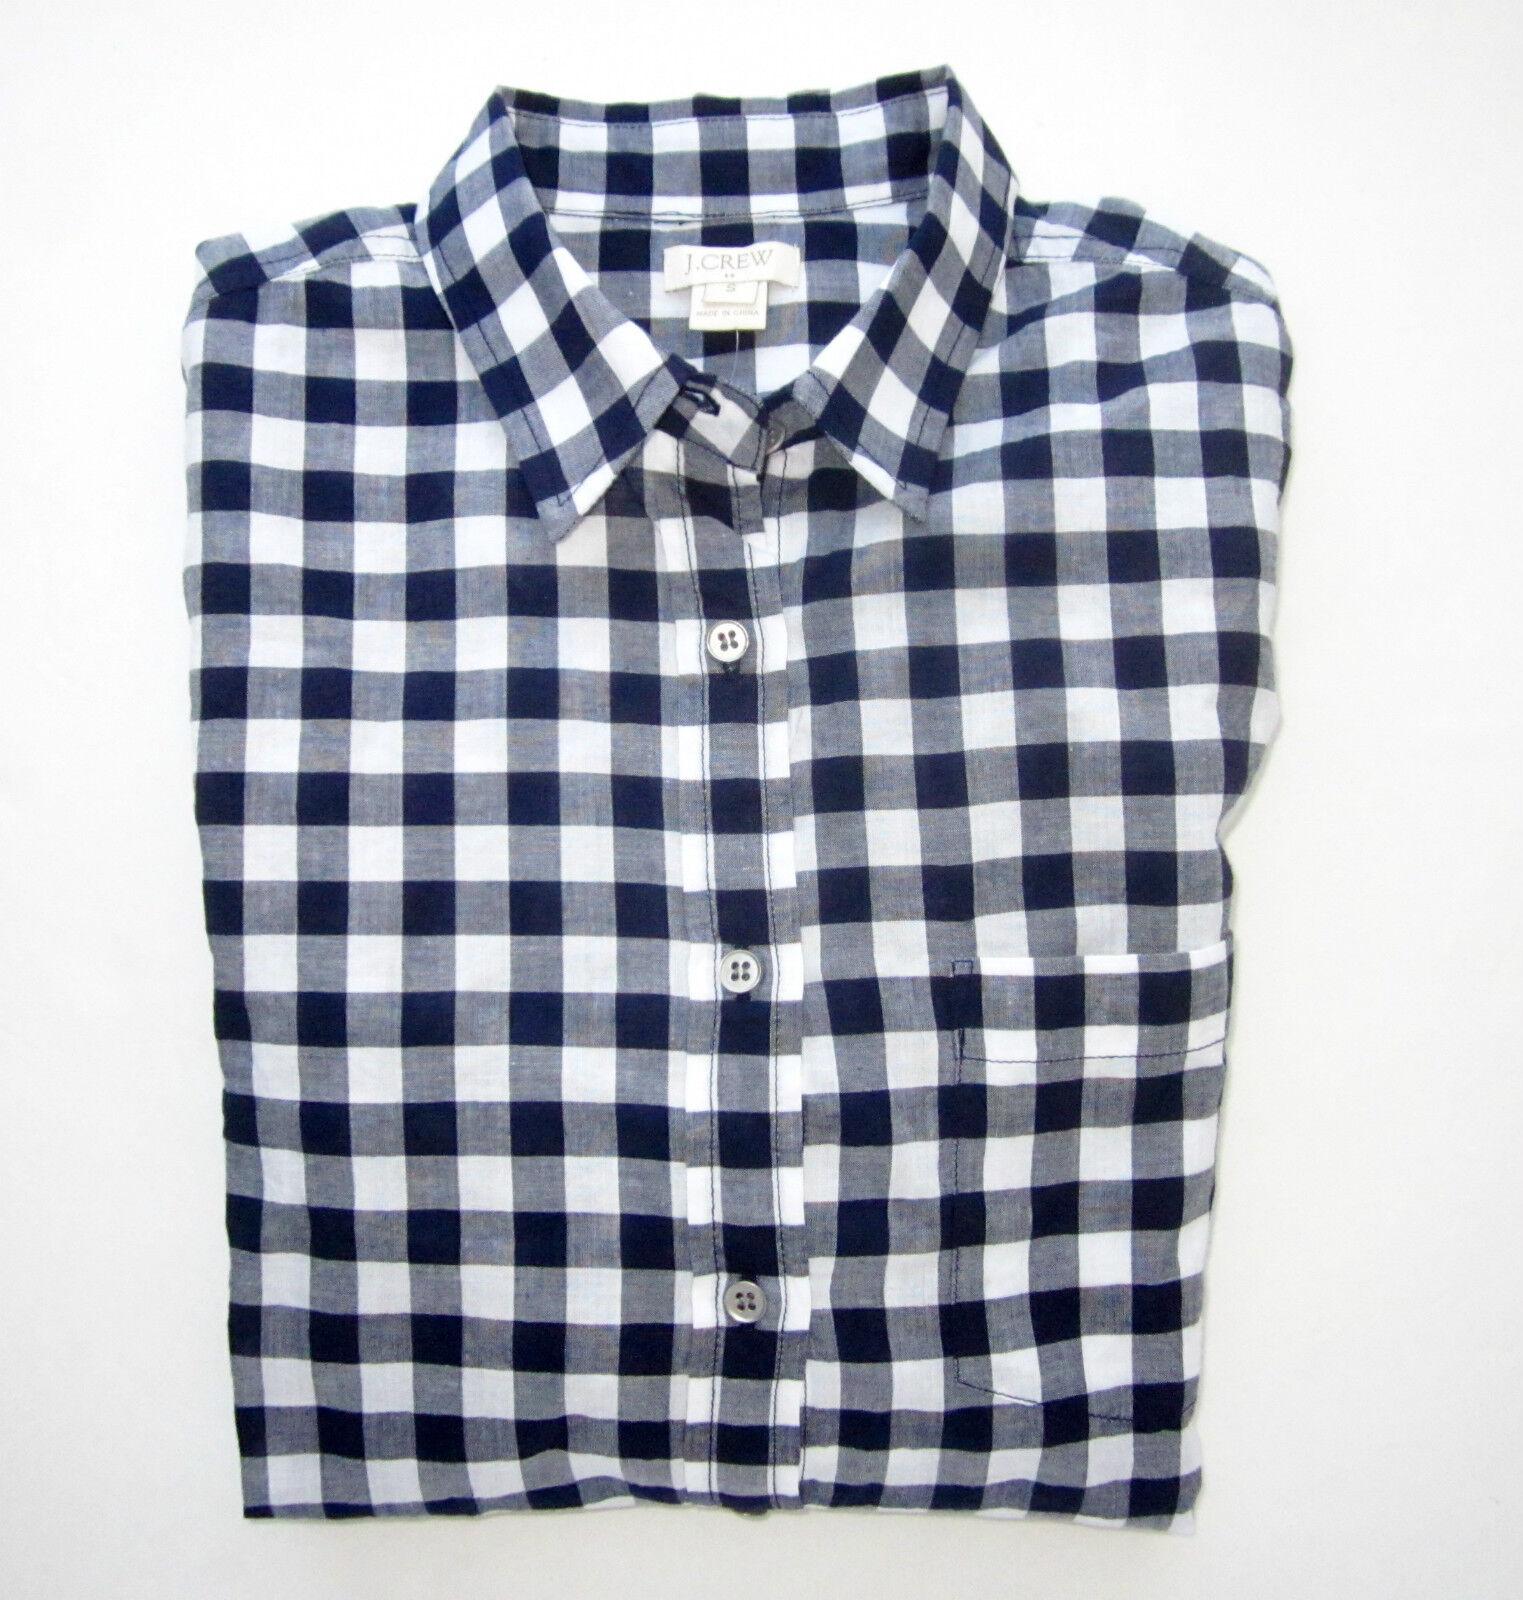 NWT J. Crew Woherren Gingham Plaid Classic Shirt Button Down Blouse M L XL